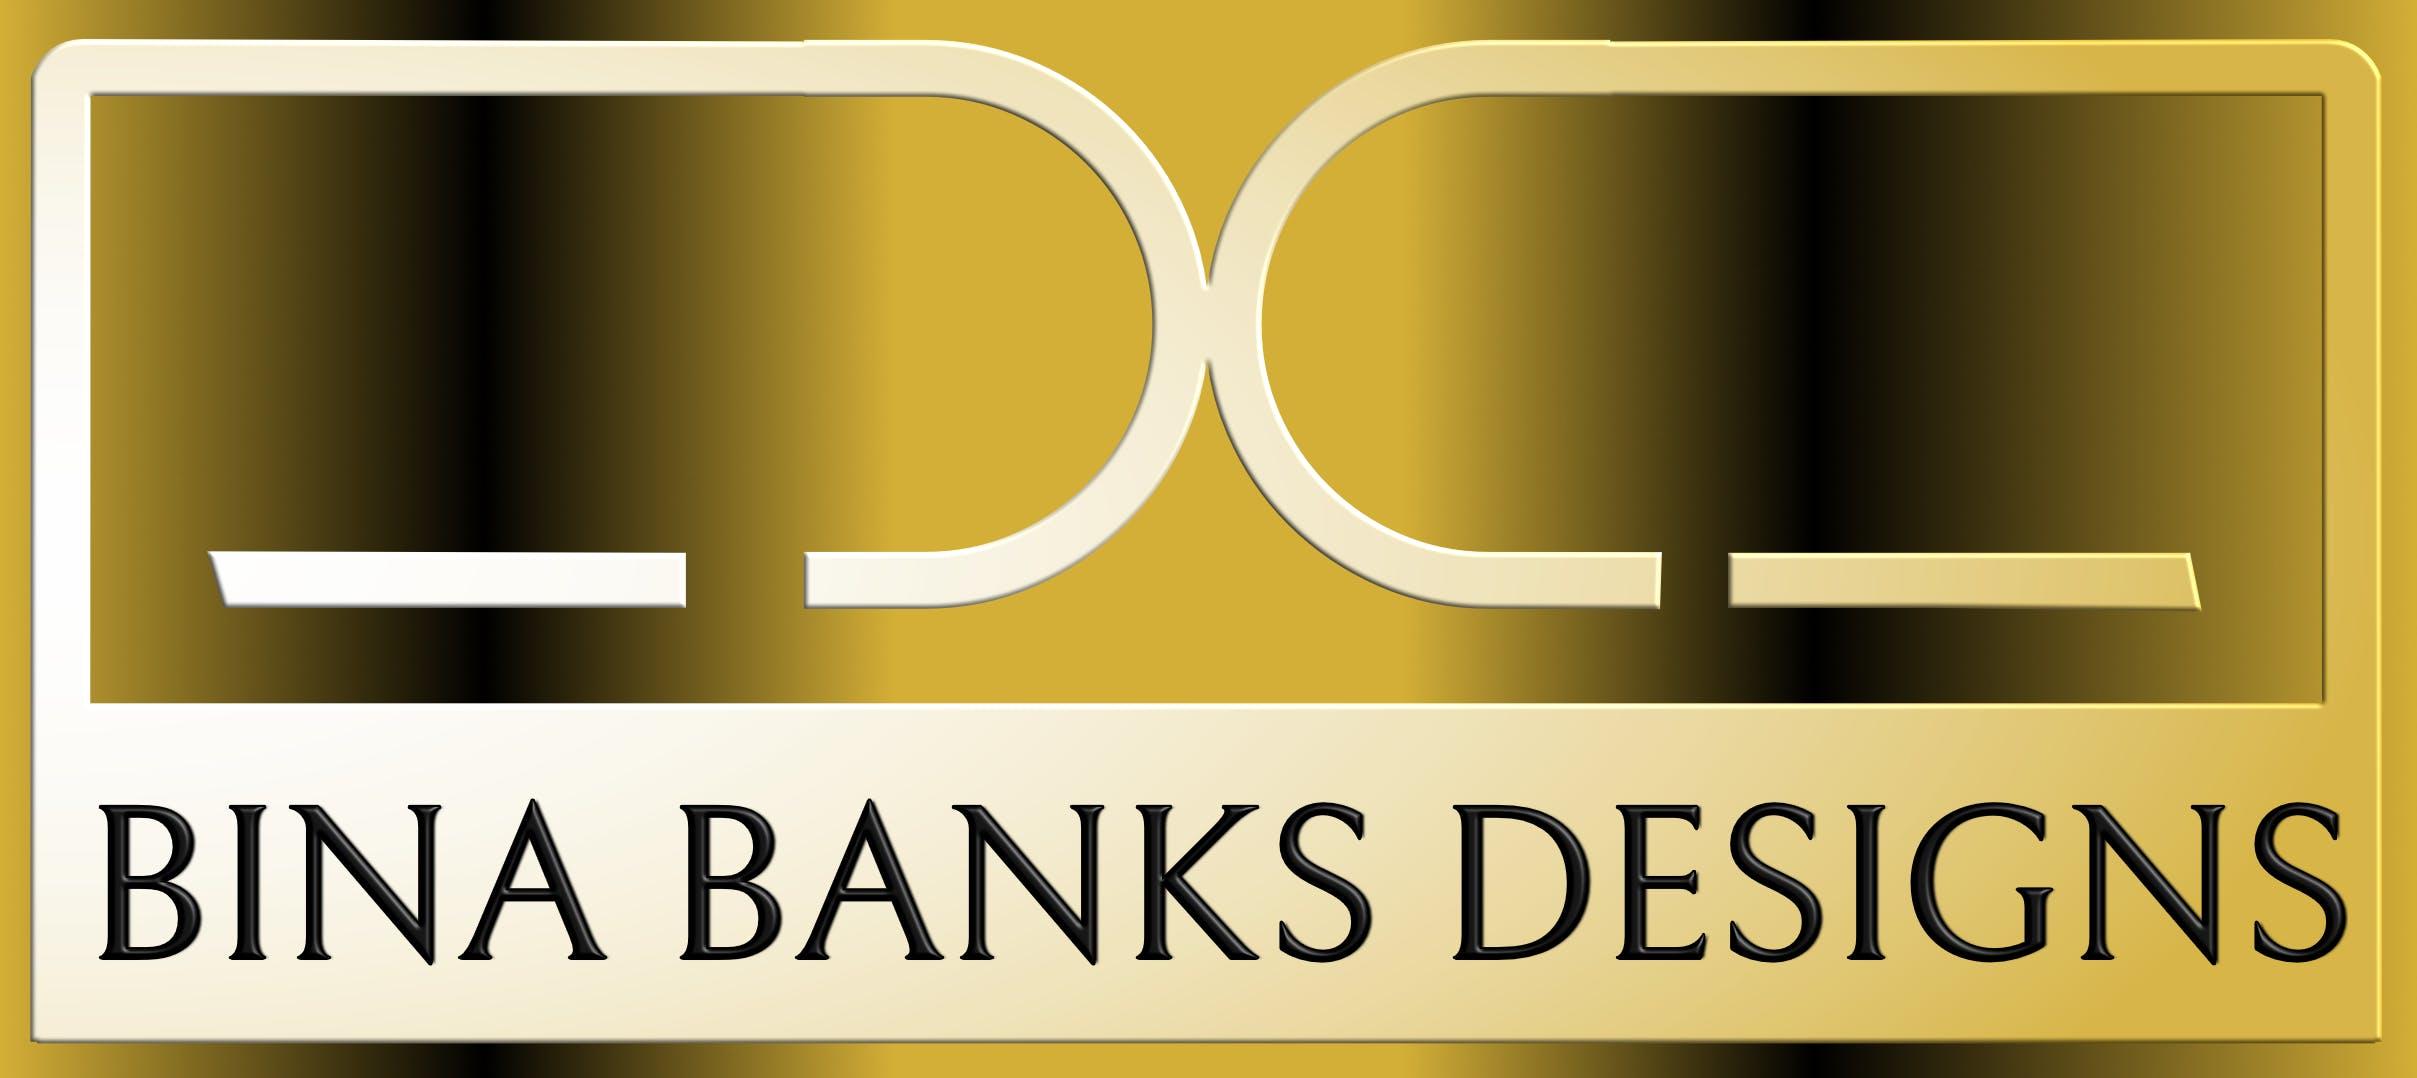 Bina Banks Designs